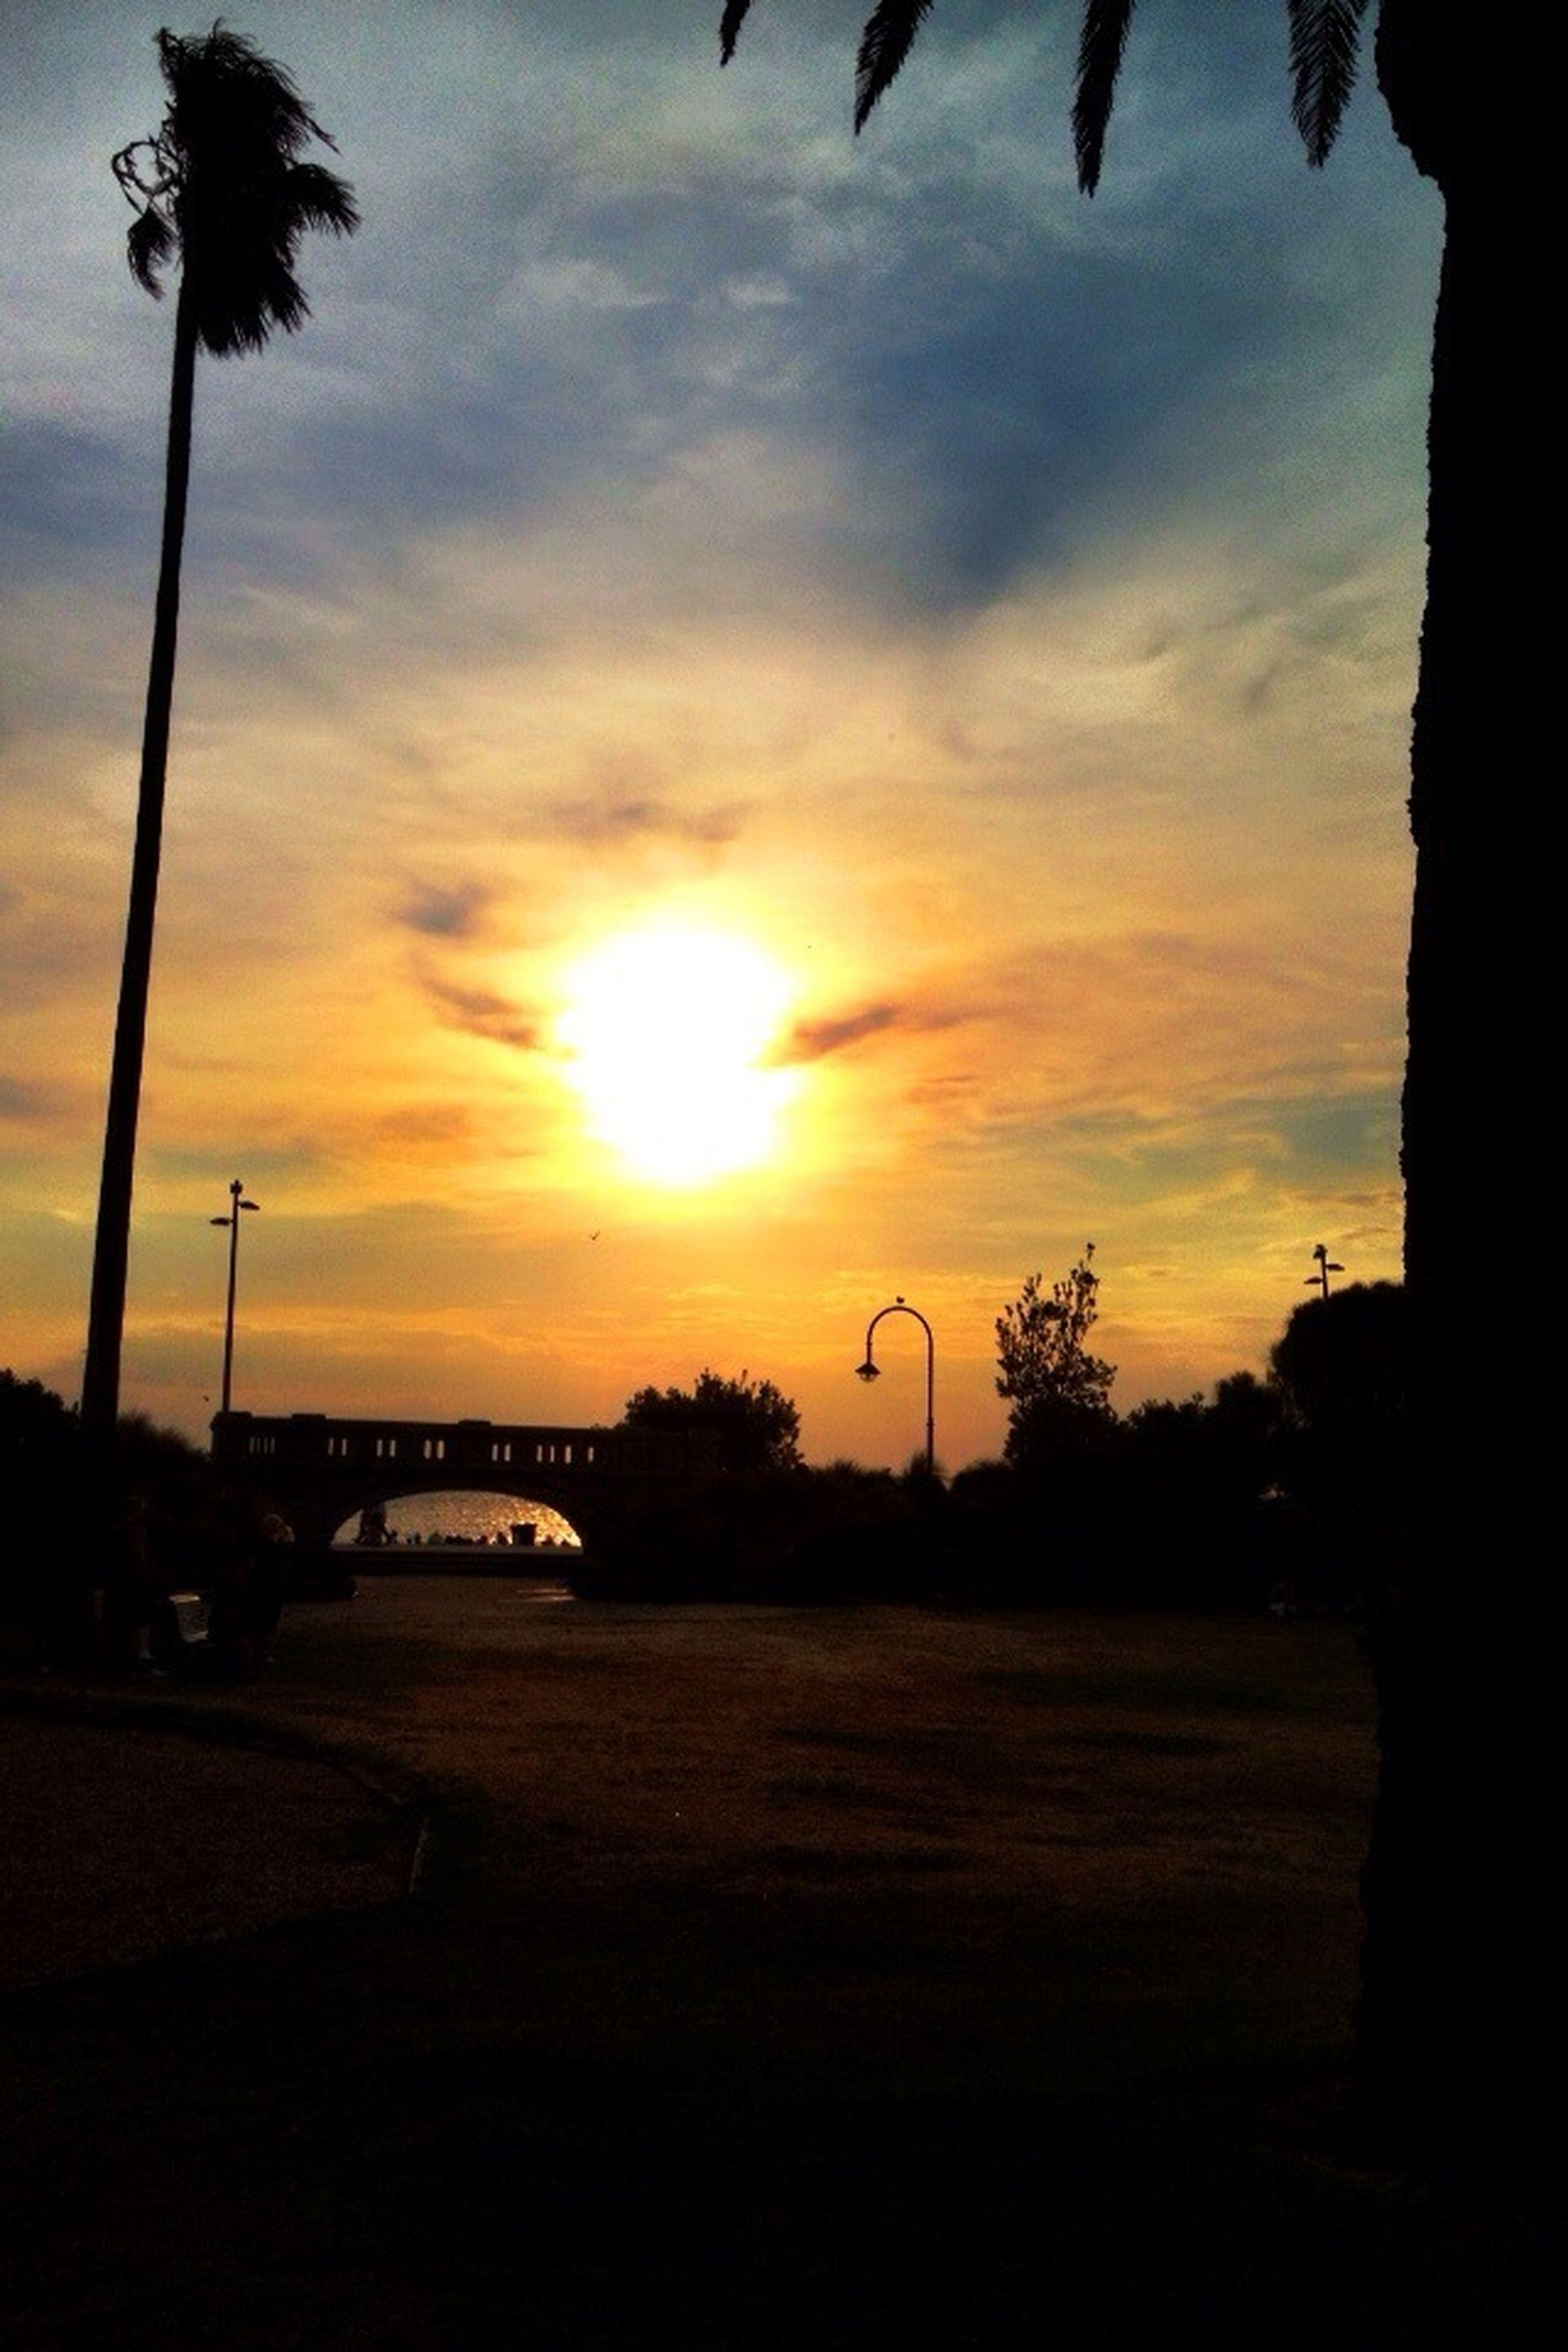 sunset, silhouette, sky, sun, tree, cloud - sky, palm tree, transportation, orange color, scenics, tranquility, cloud, beauty in nature, tranquil scene, car, sunlight, road, nature, land vehicle, idyllic